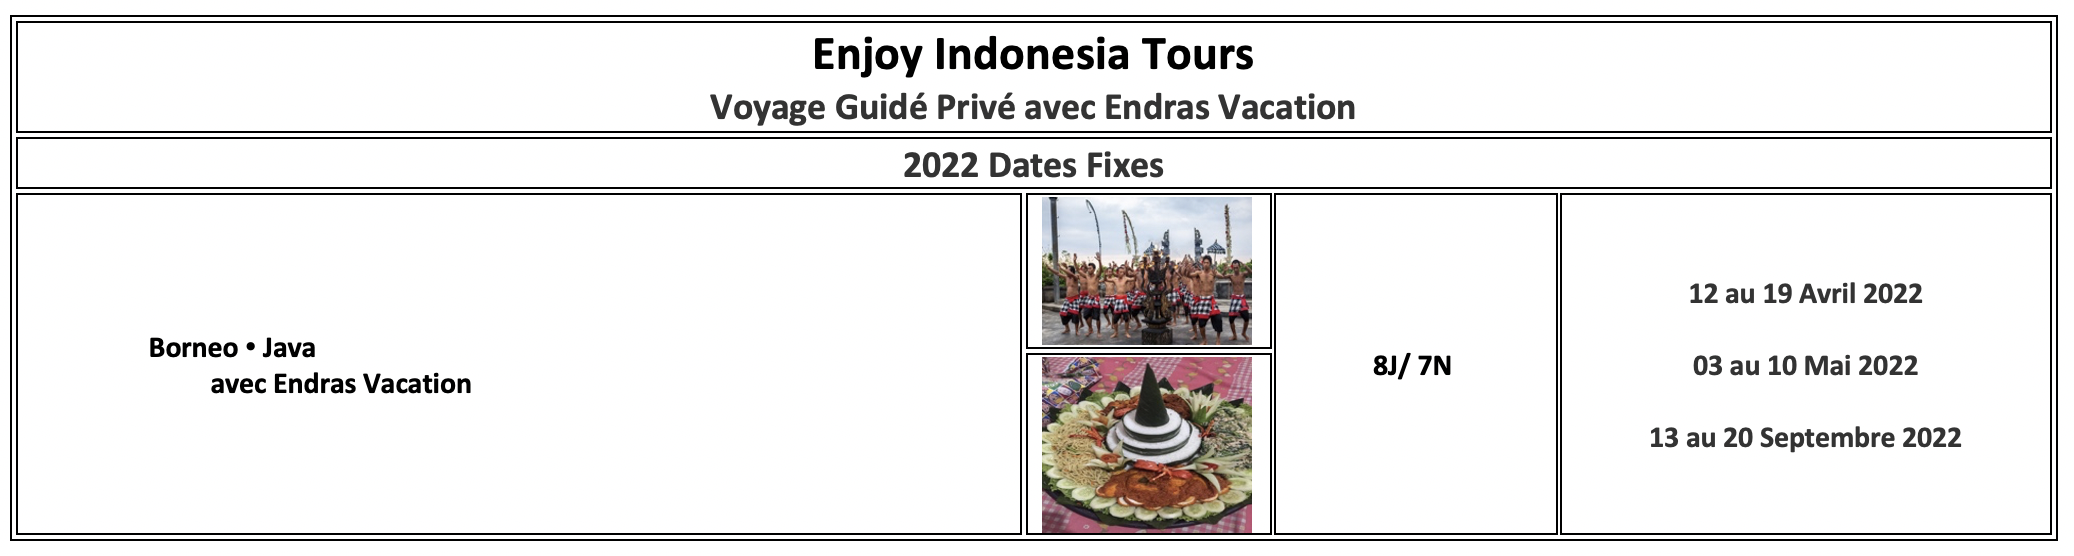 Enjoy Indonesia Tours Borneo Java 2022 French